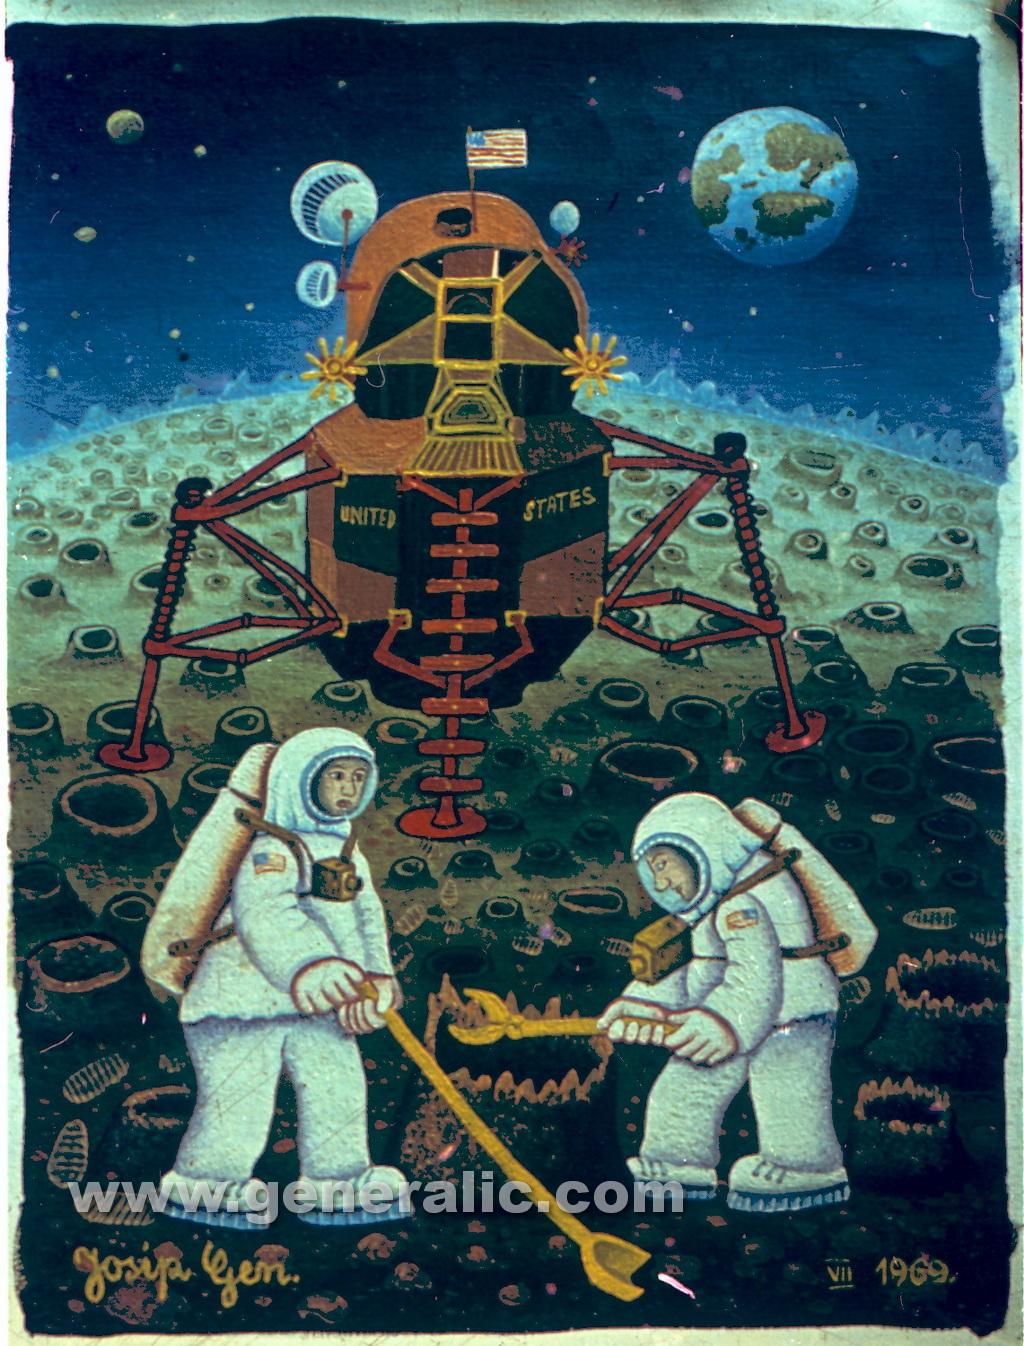 Josip Generalic, 1969, Americans on the Moon, oil on canvas